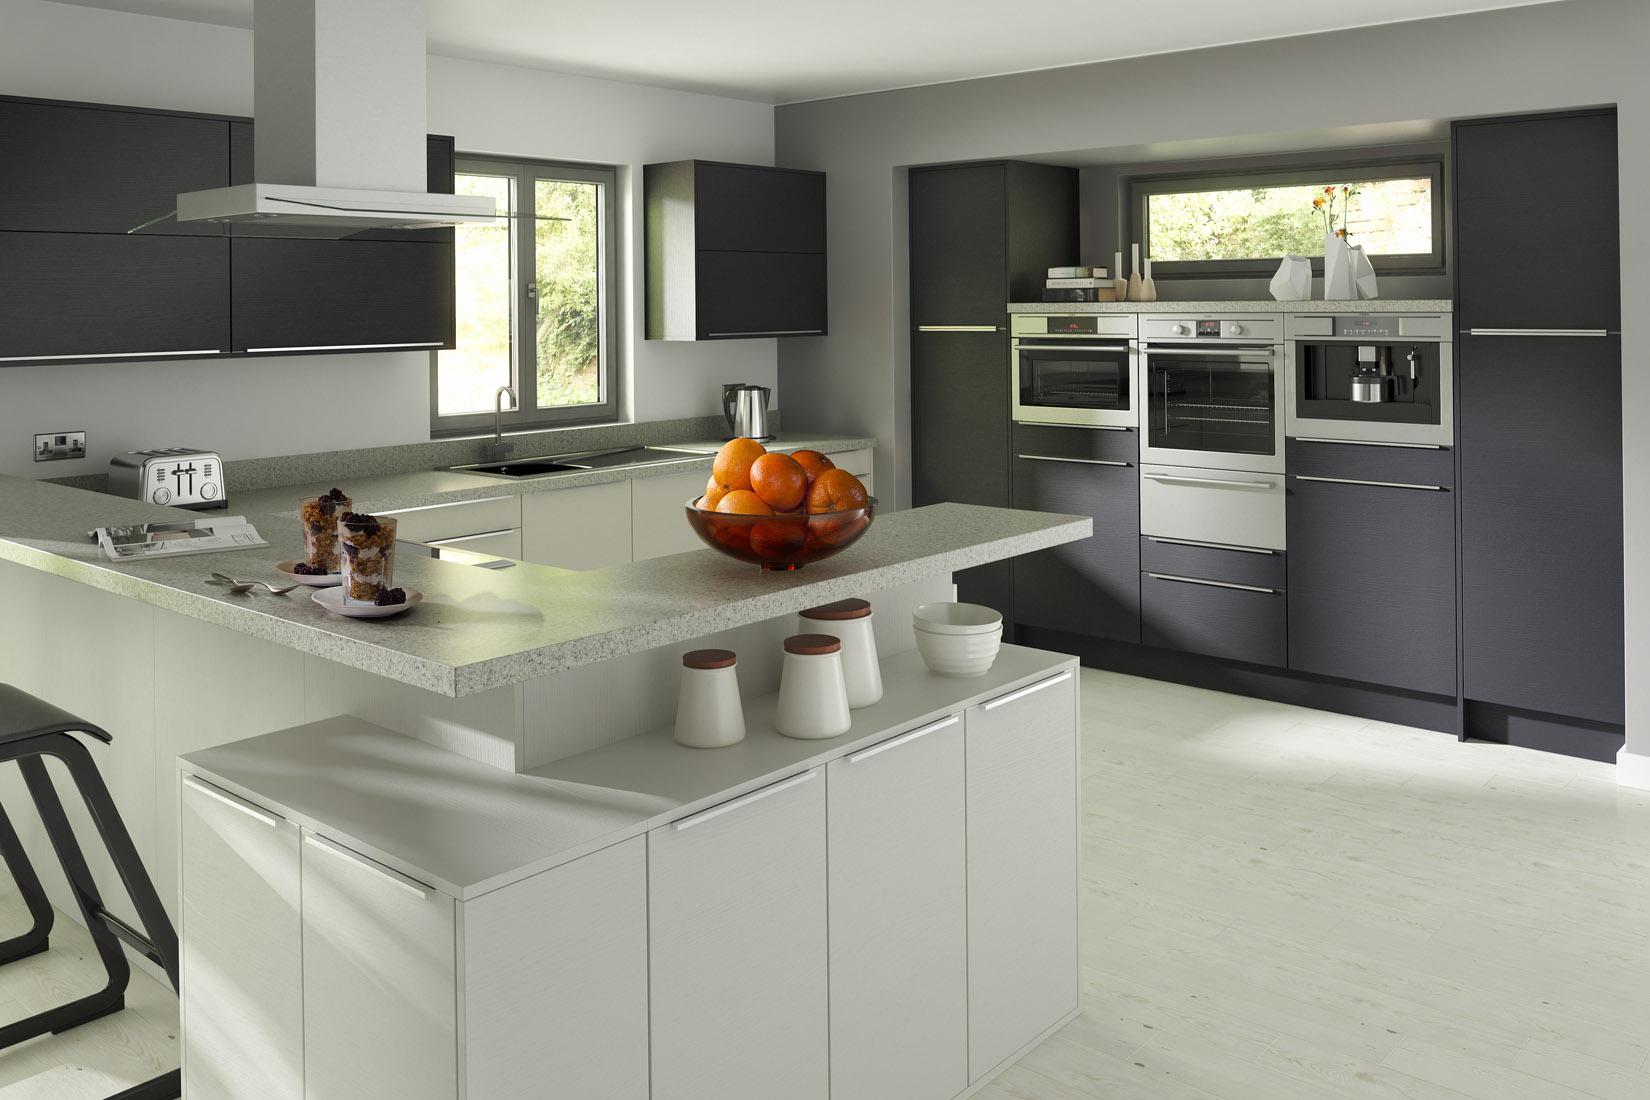 SHERATON - Pocklington Kitchen And Bathrooms